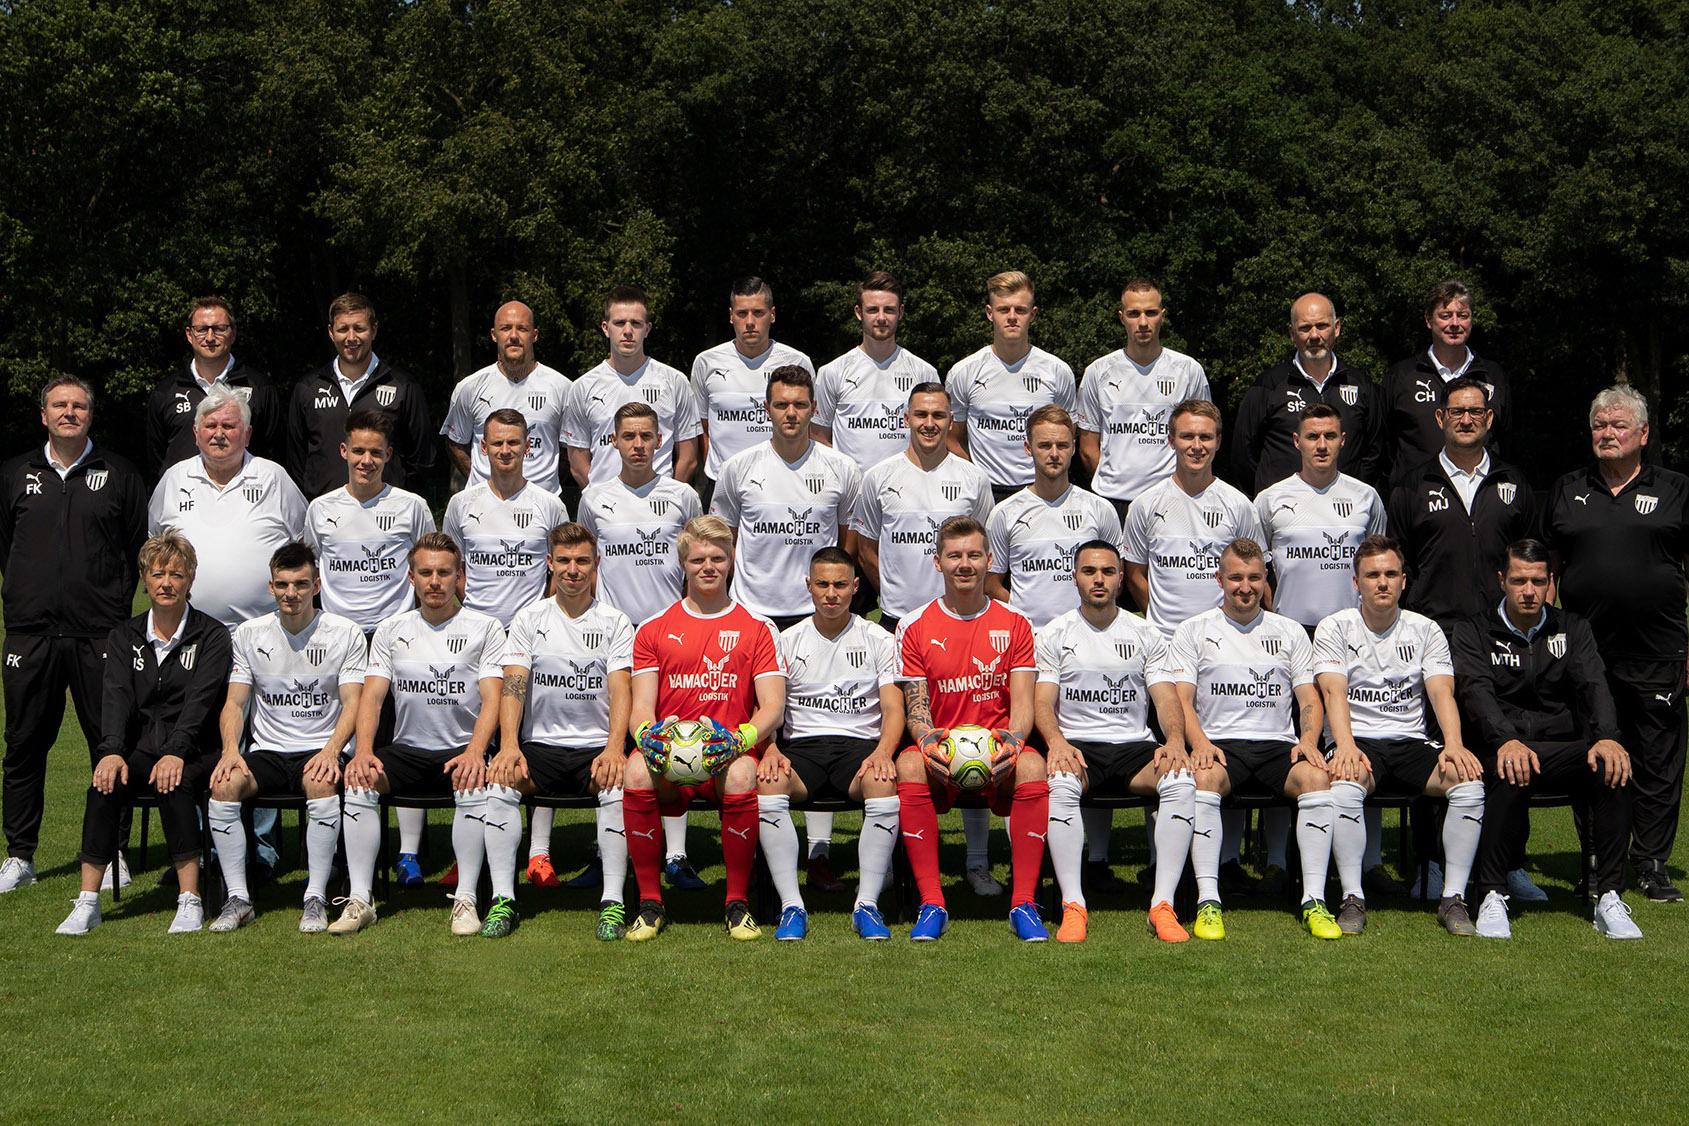 Verstärkte Stadtauswahl empfängt den 1.FC Bocholt